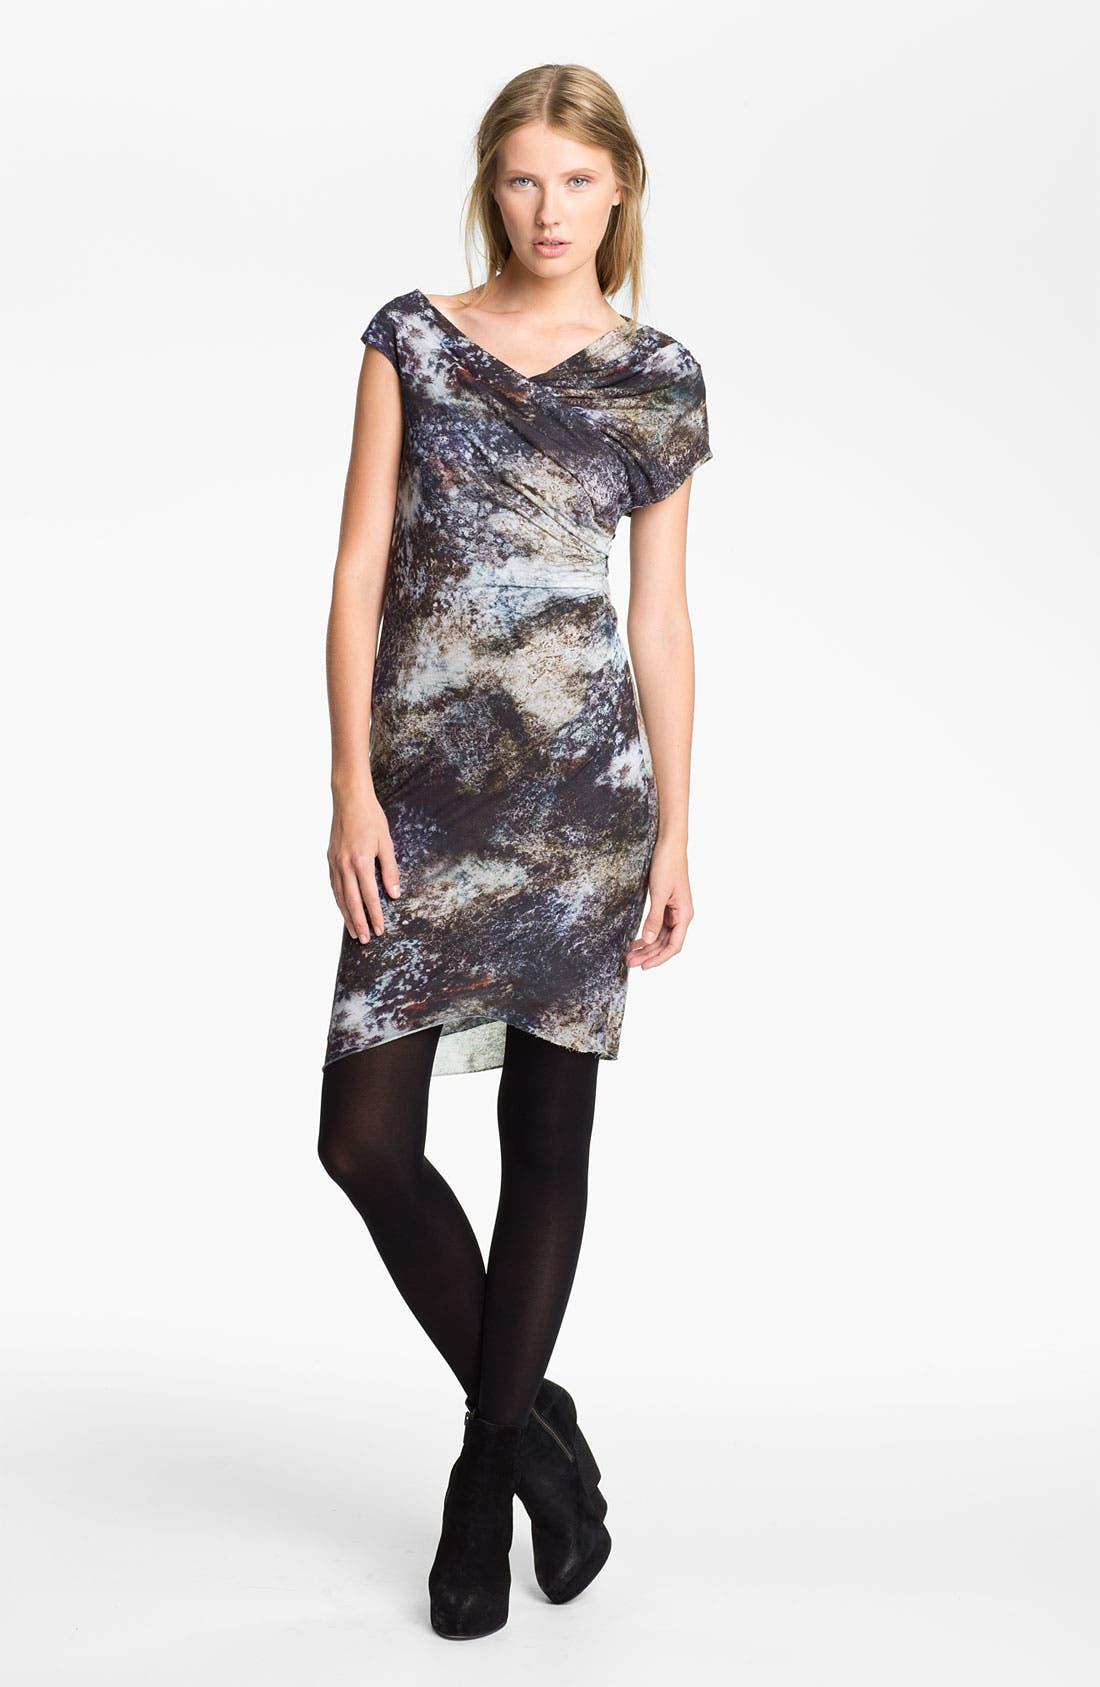 Main Image - Helmut Lang 'Oxide Print' Twisted Dress